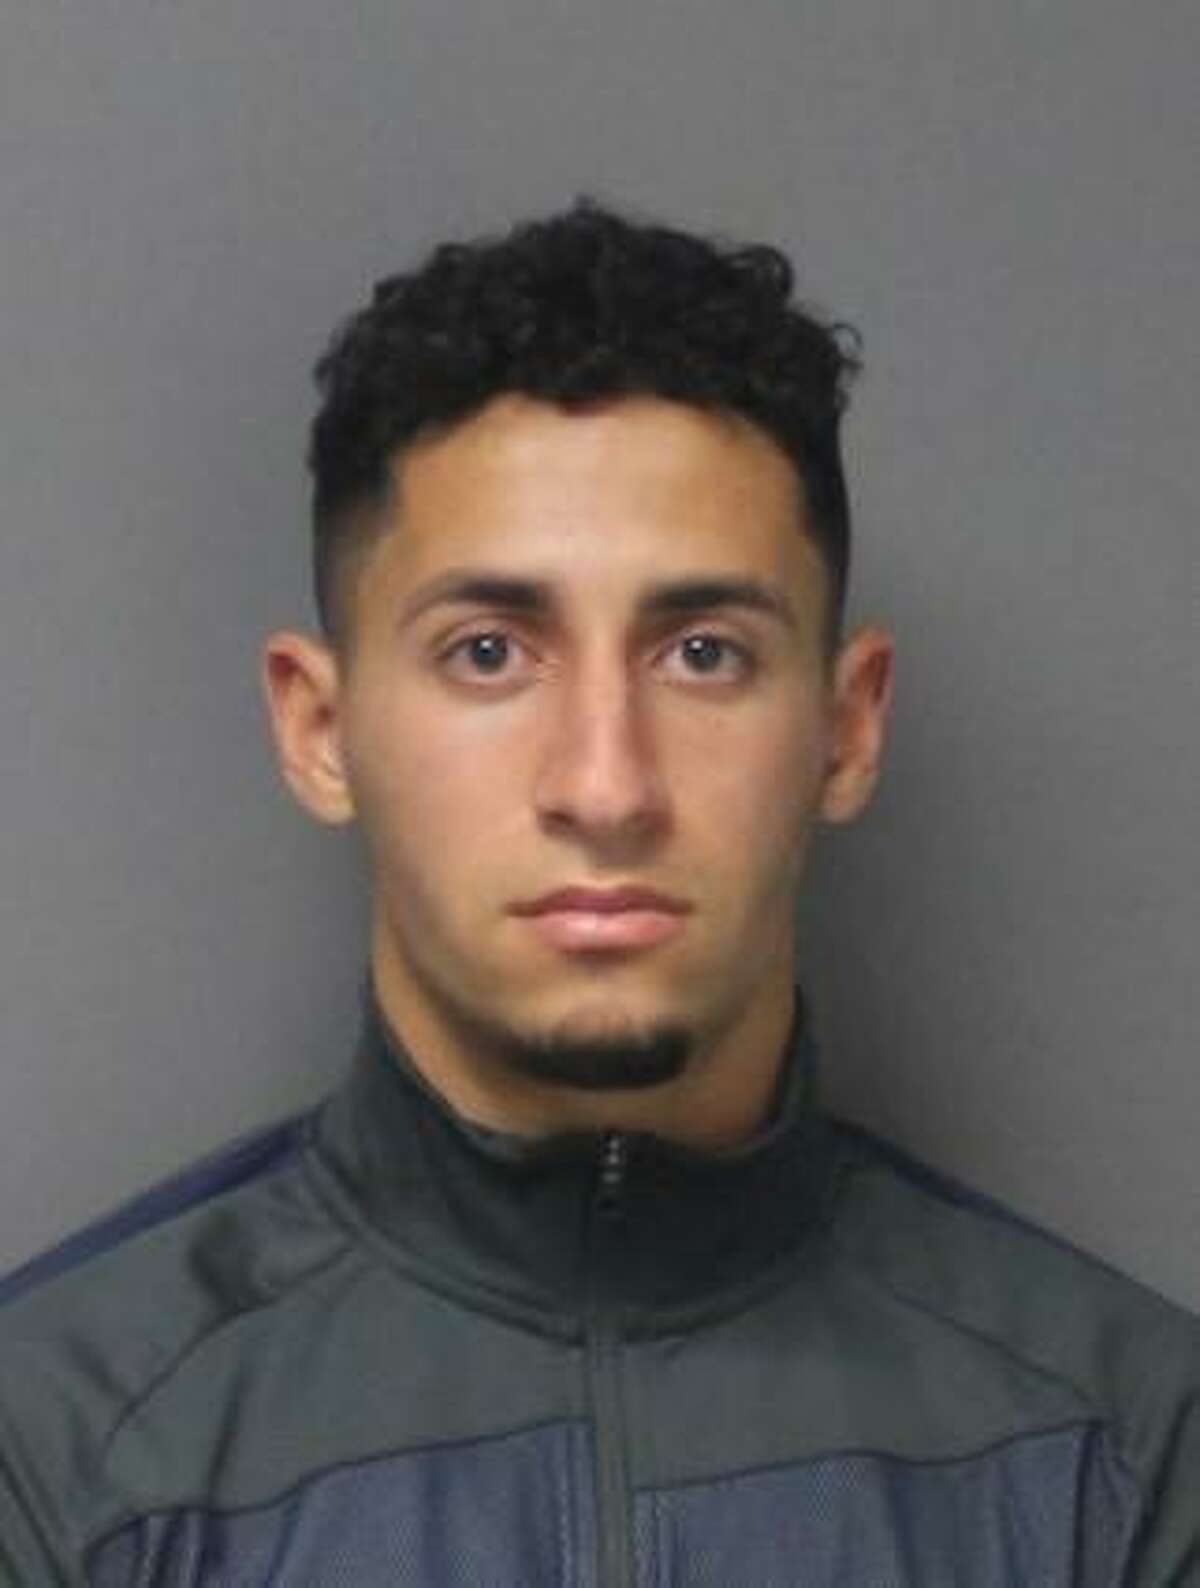 Ziyad Fekri, 21